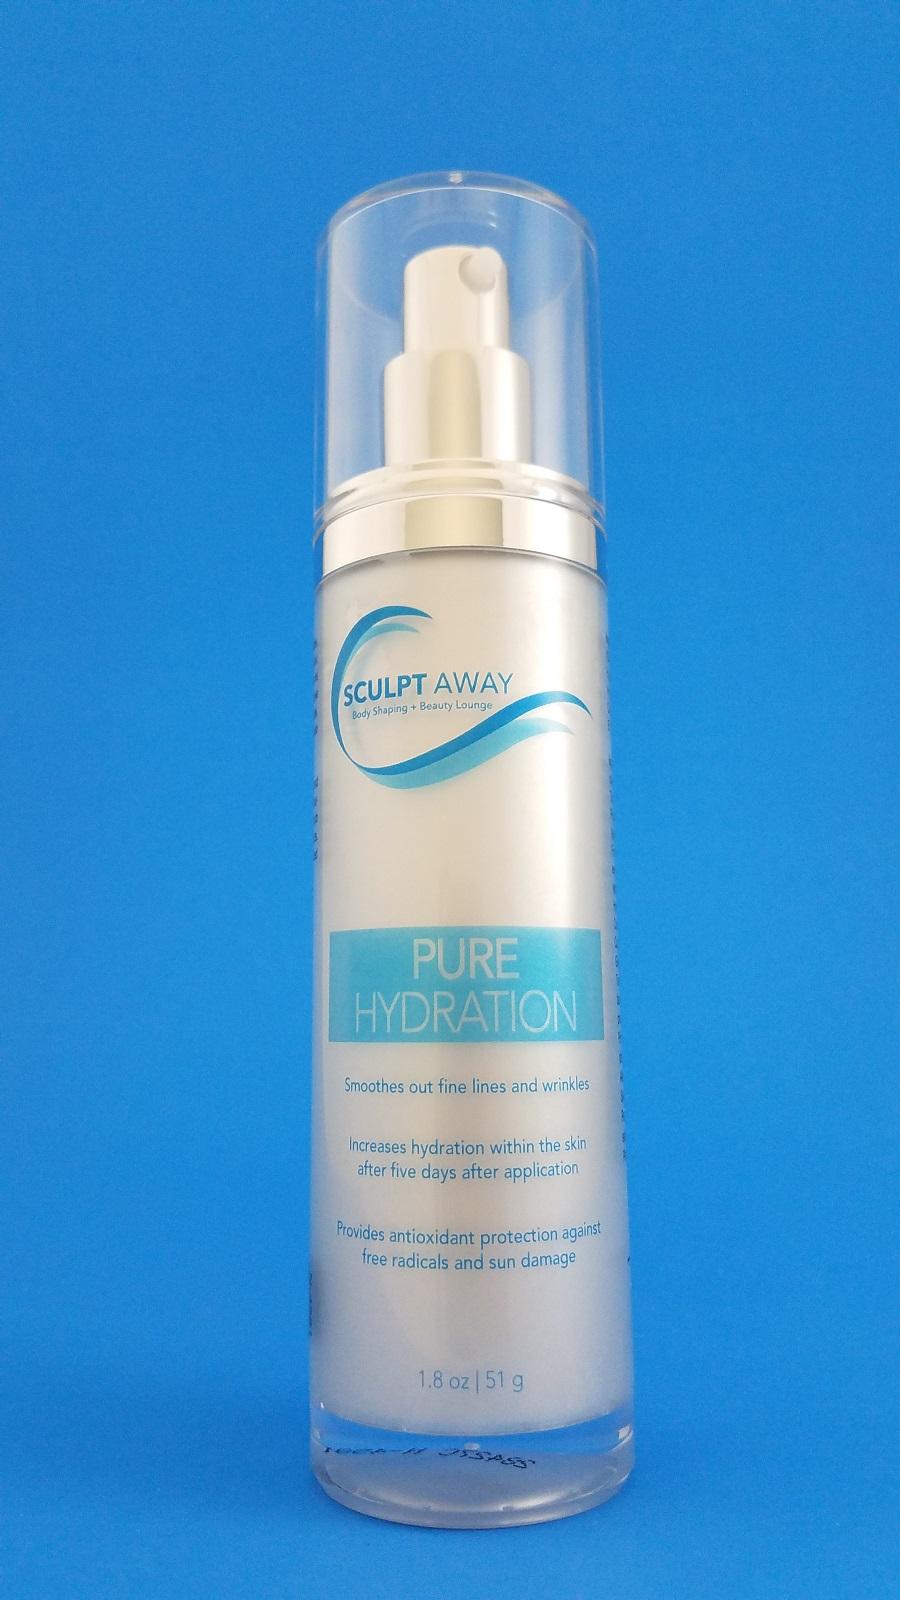 Sculpt Away San Antonio beauty treatments - Pure Hydration™